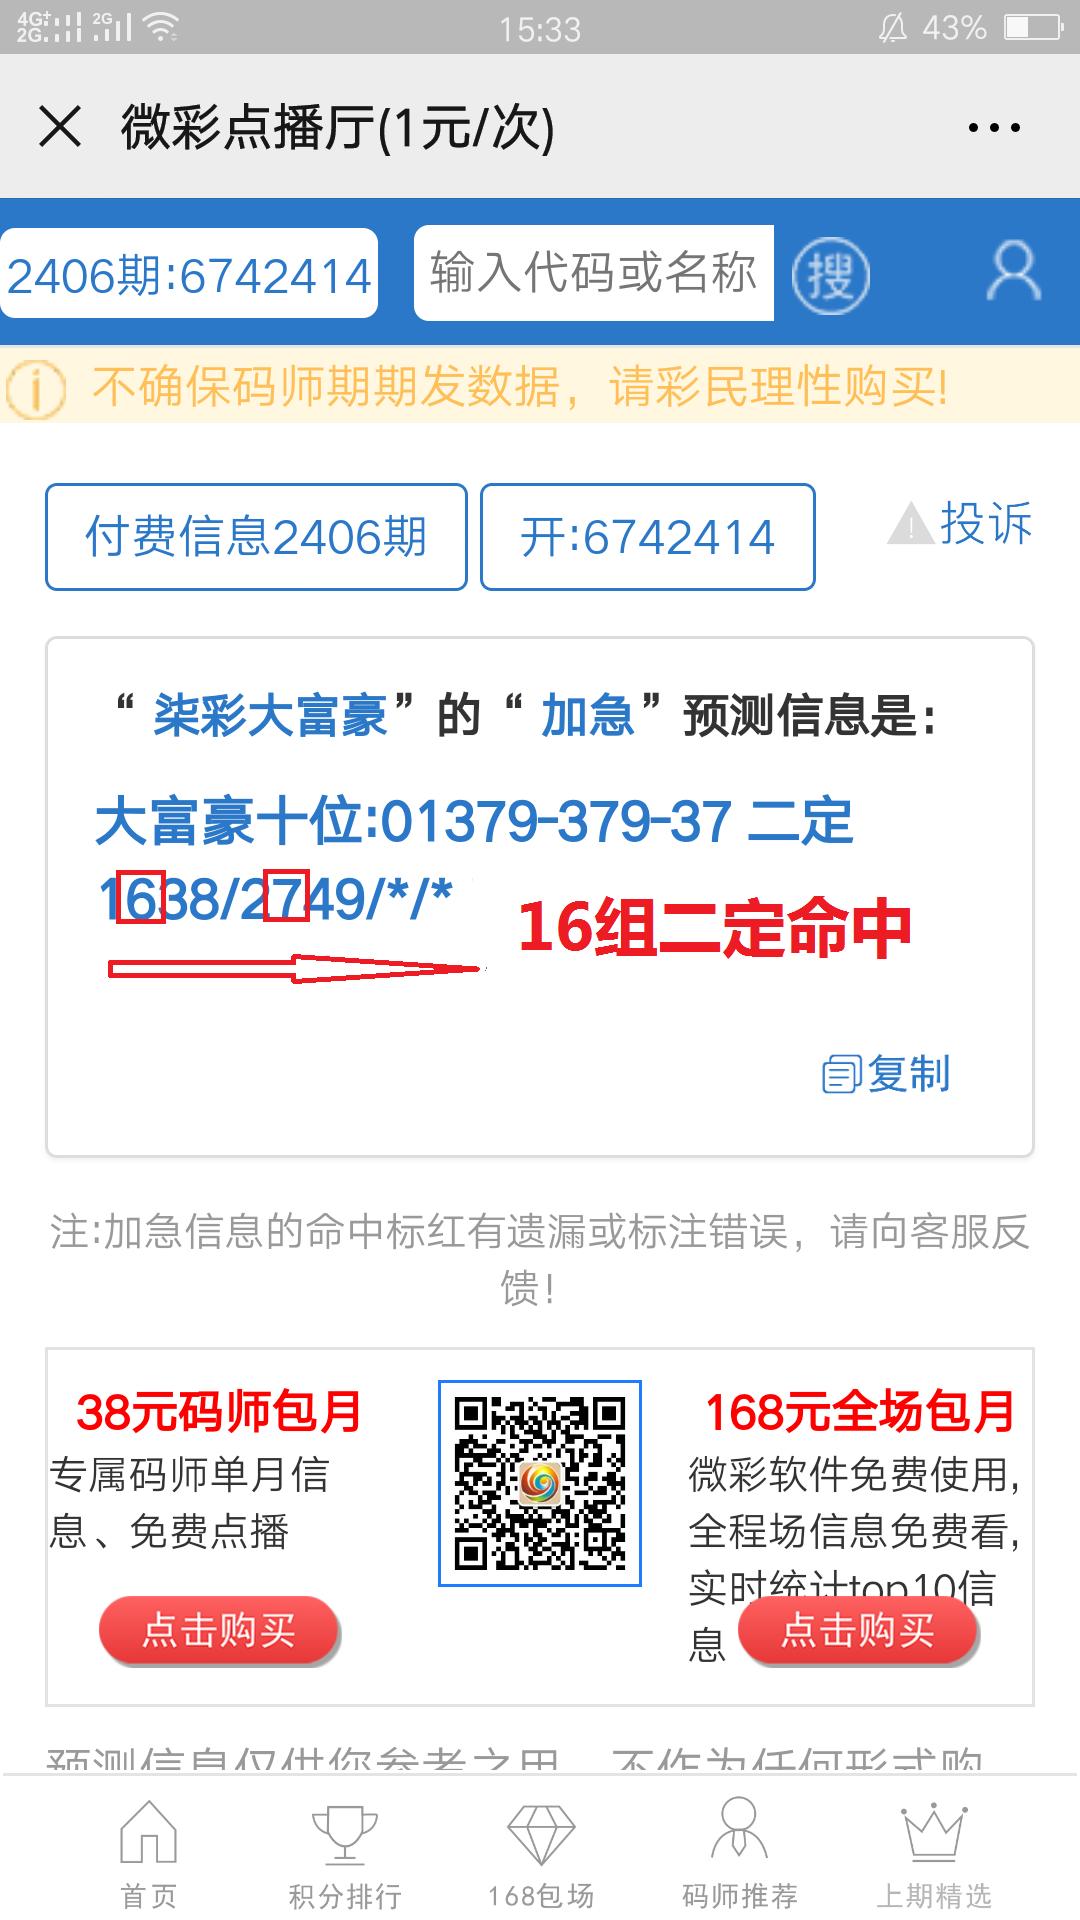 Screenshot_2020-02-07-15-33-42-94.png